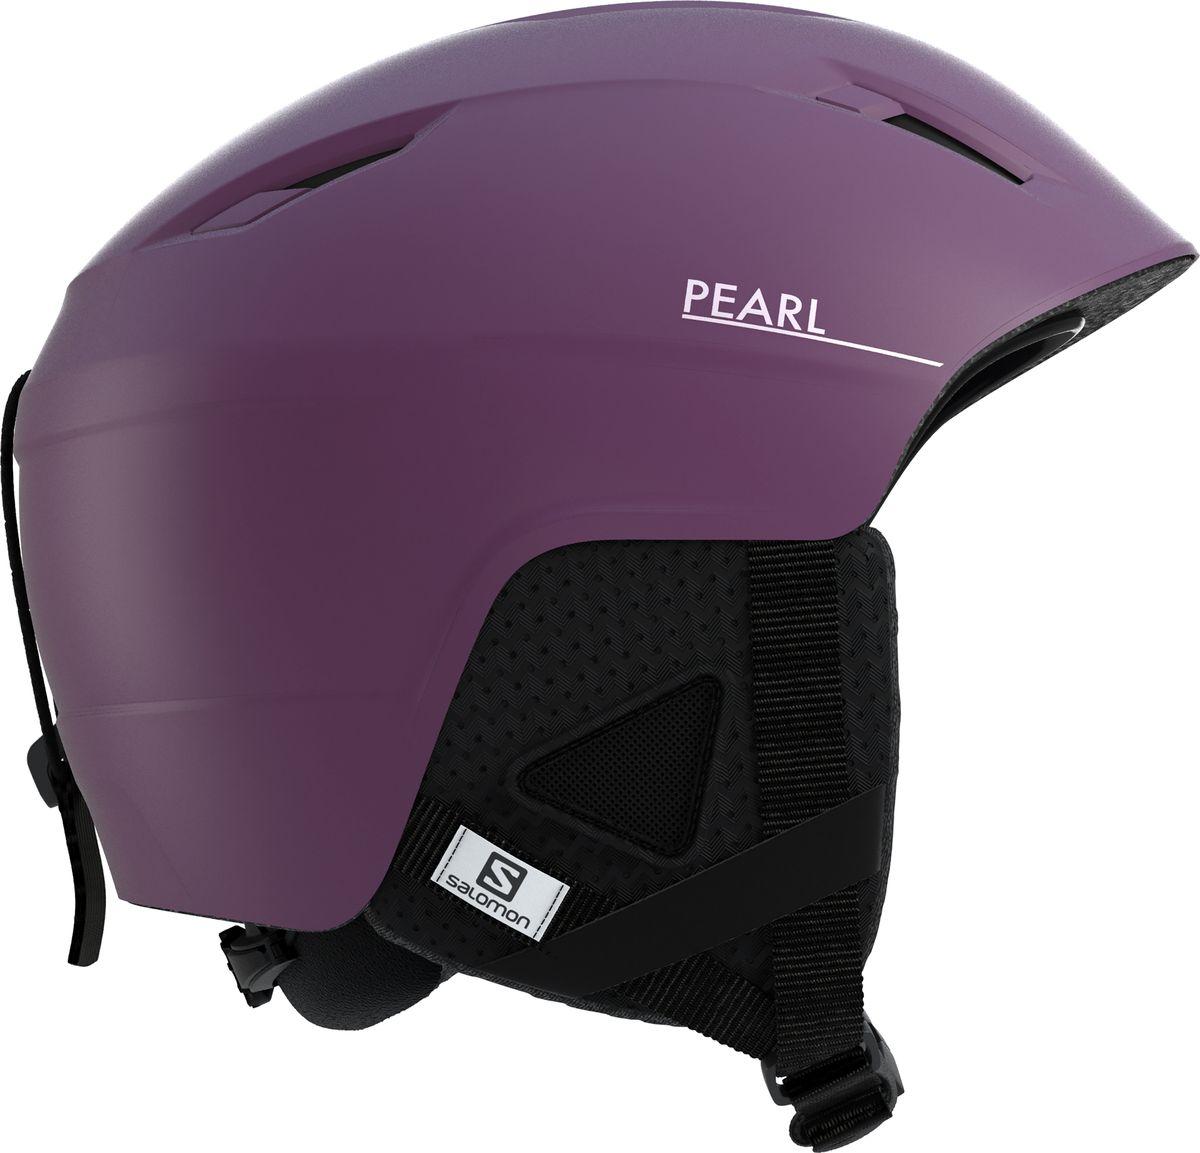 Шлем горнолыжный Salomon Pearl2+ Fig, цвет: фиолетовый. Размер S (53-56)